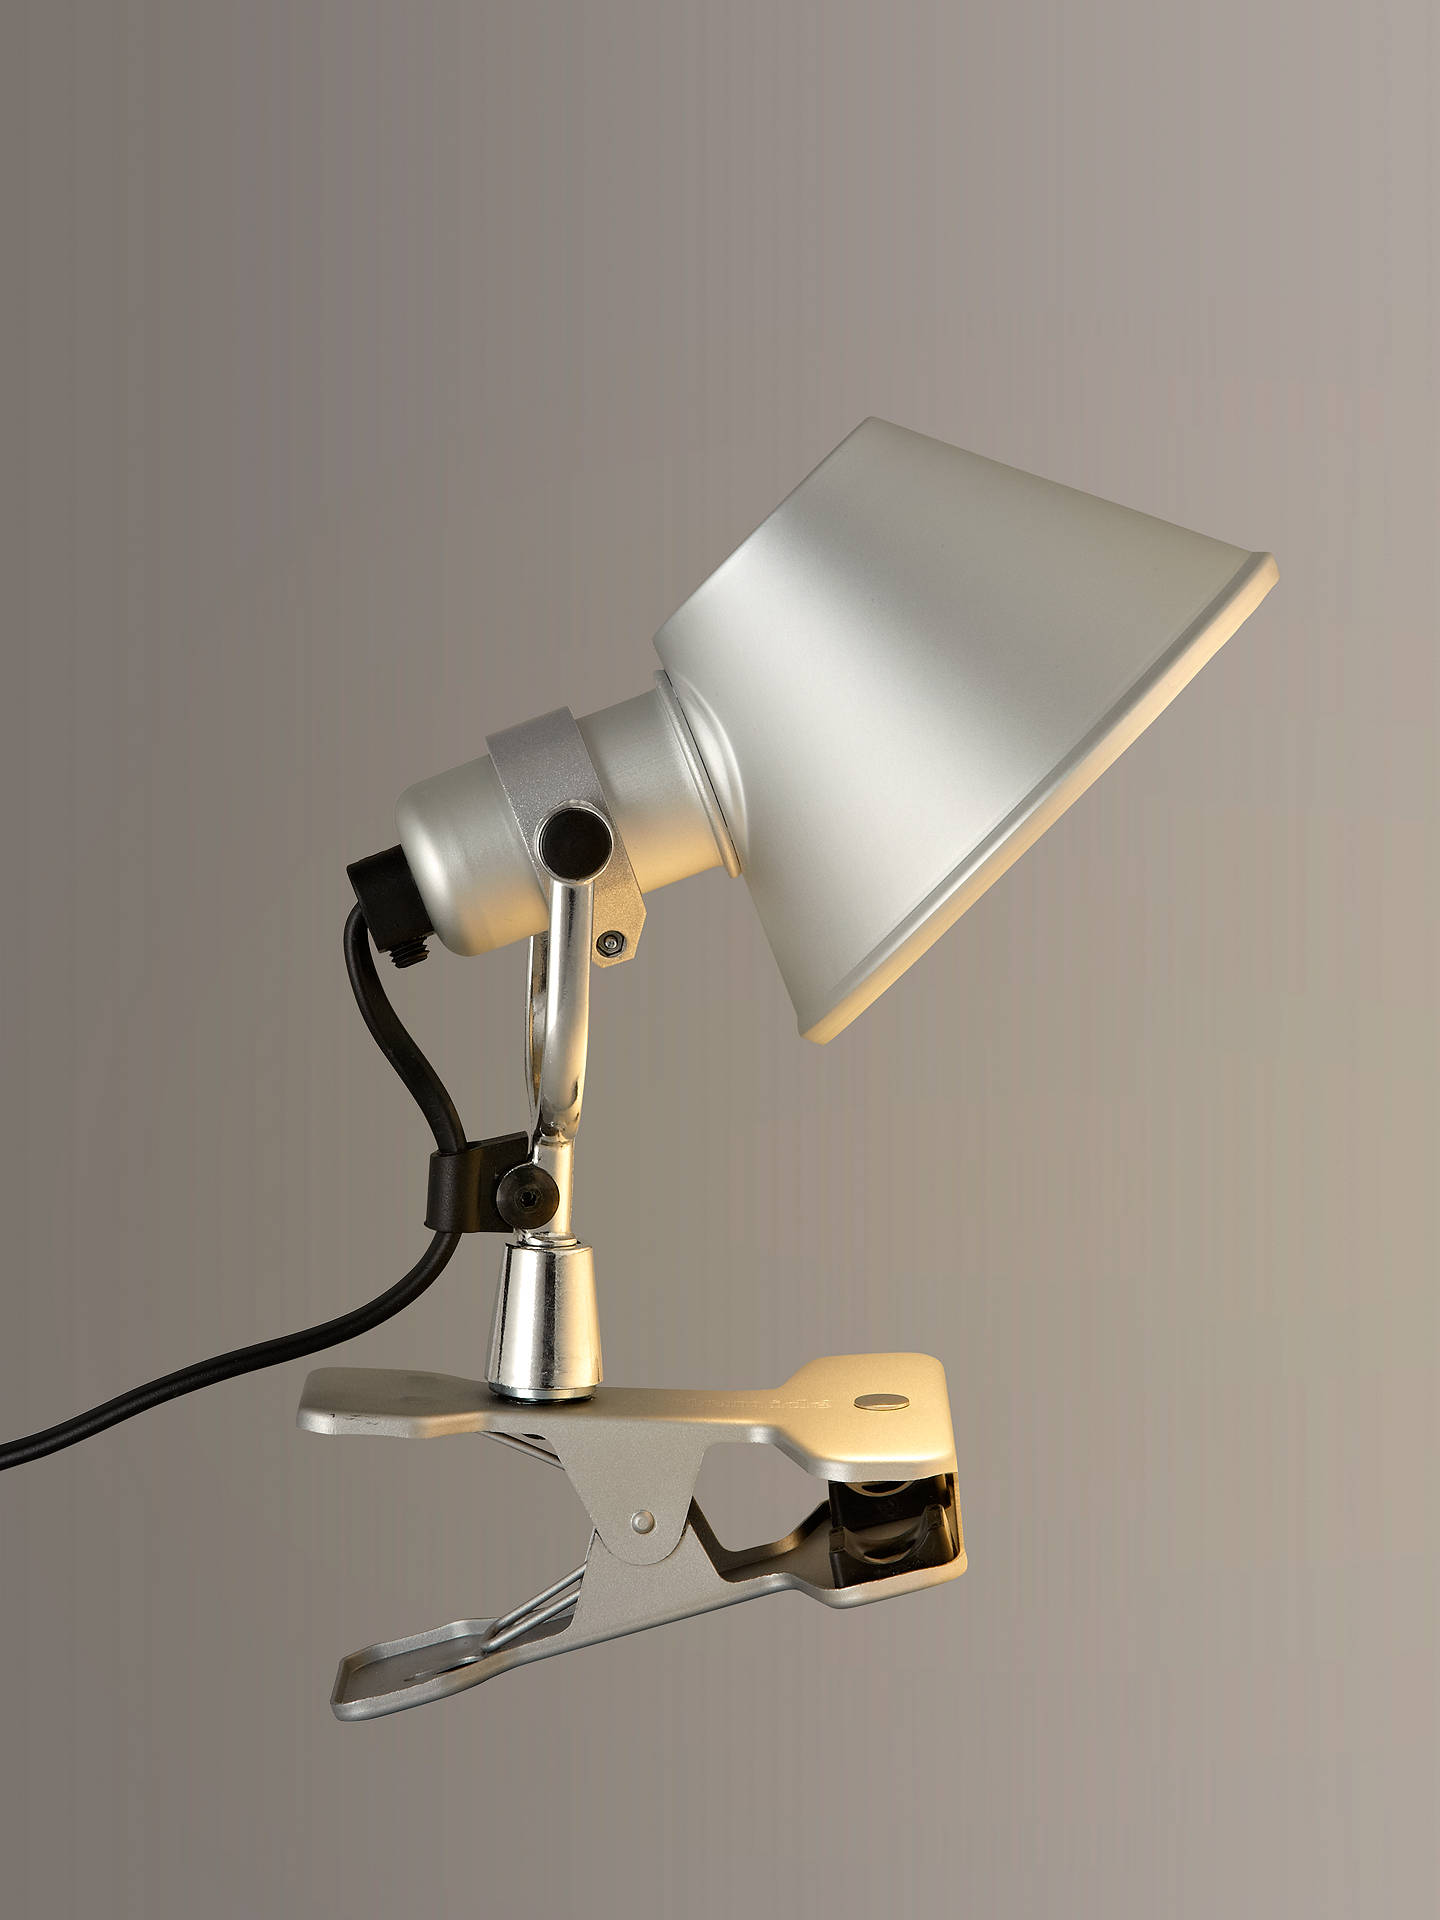 Artemide Tolomeo Micro Clip Task Light At John Lewis